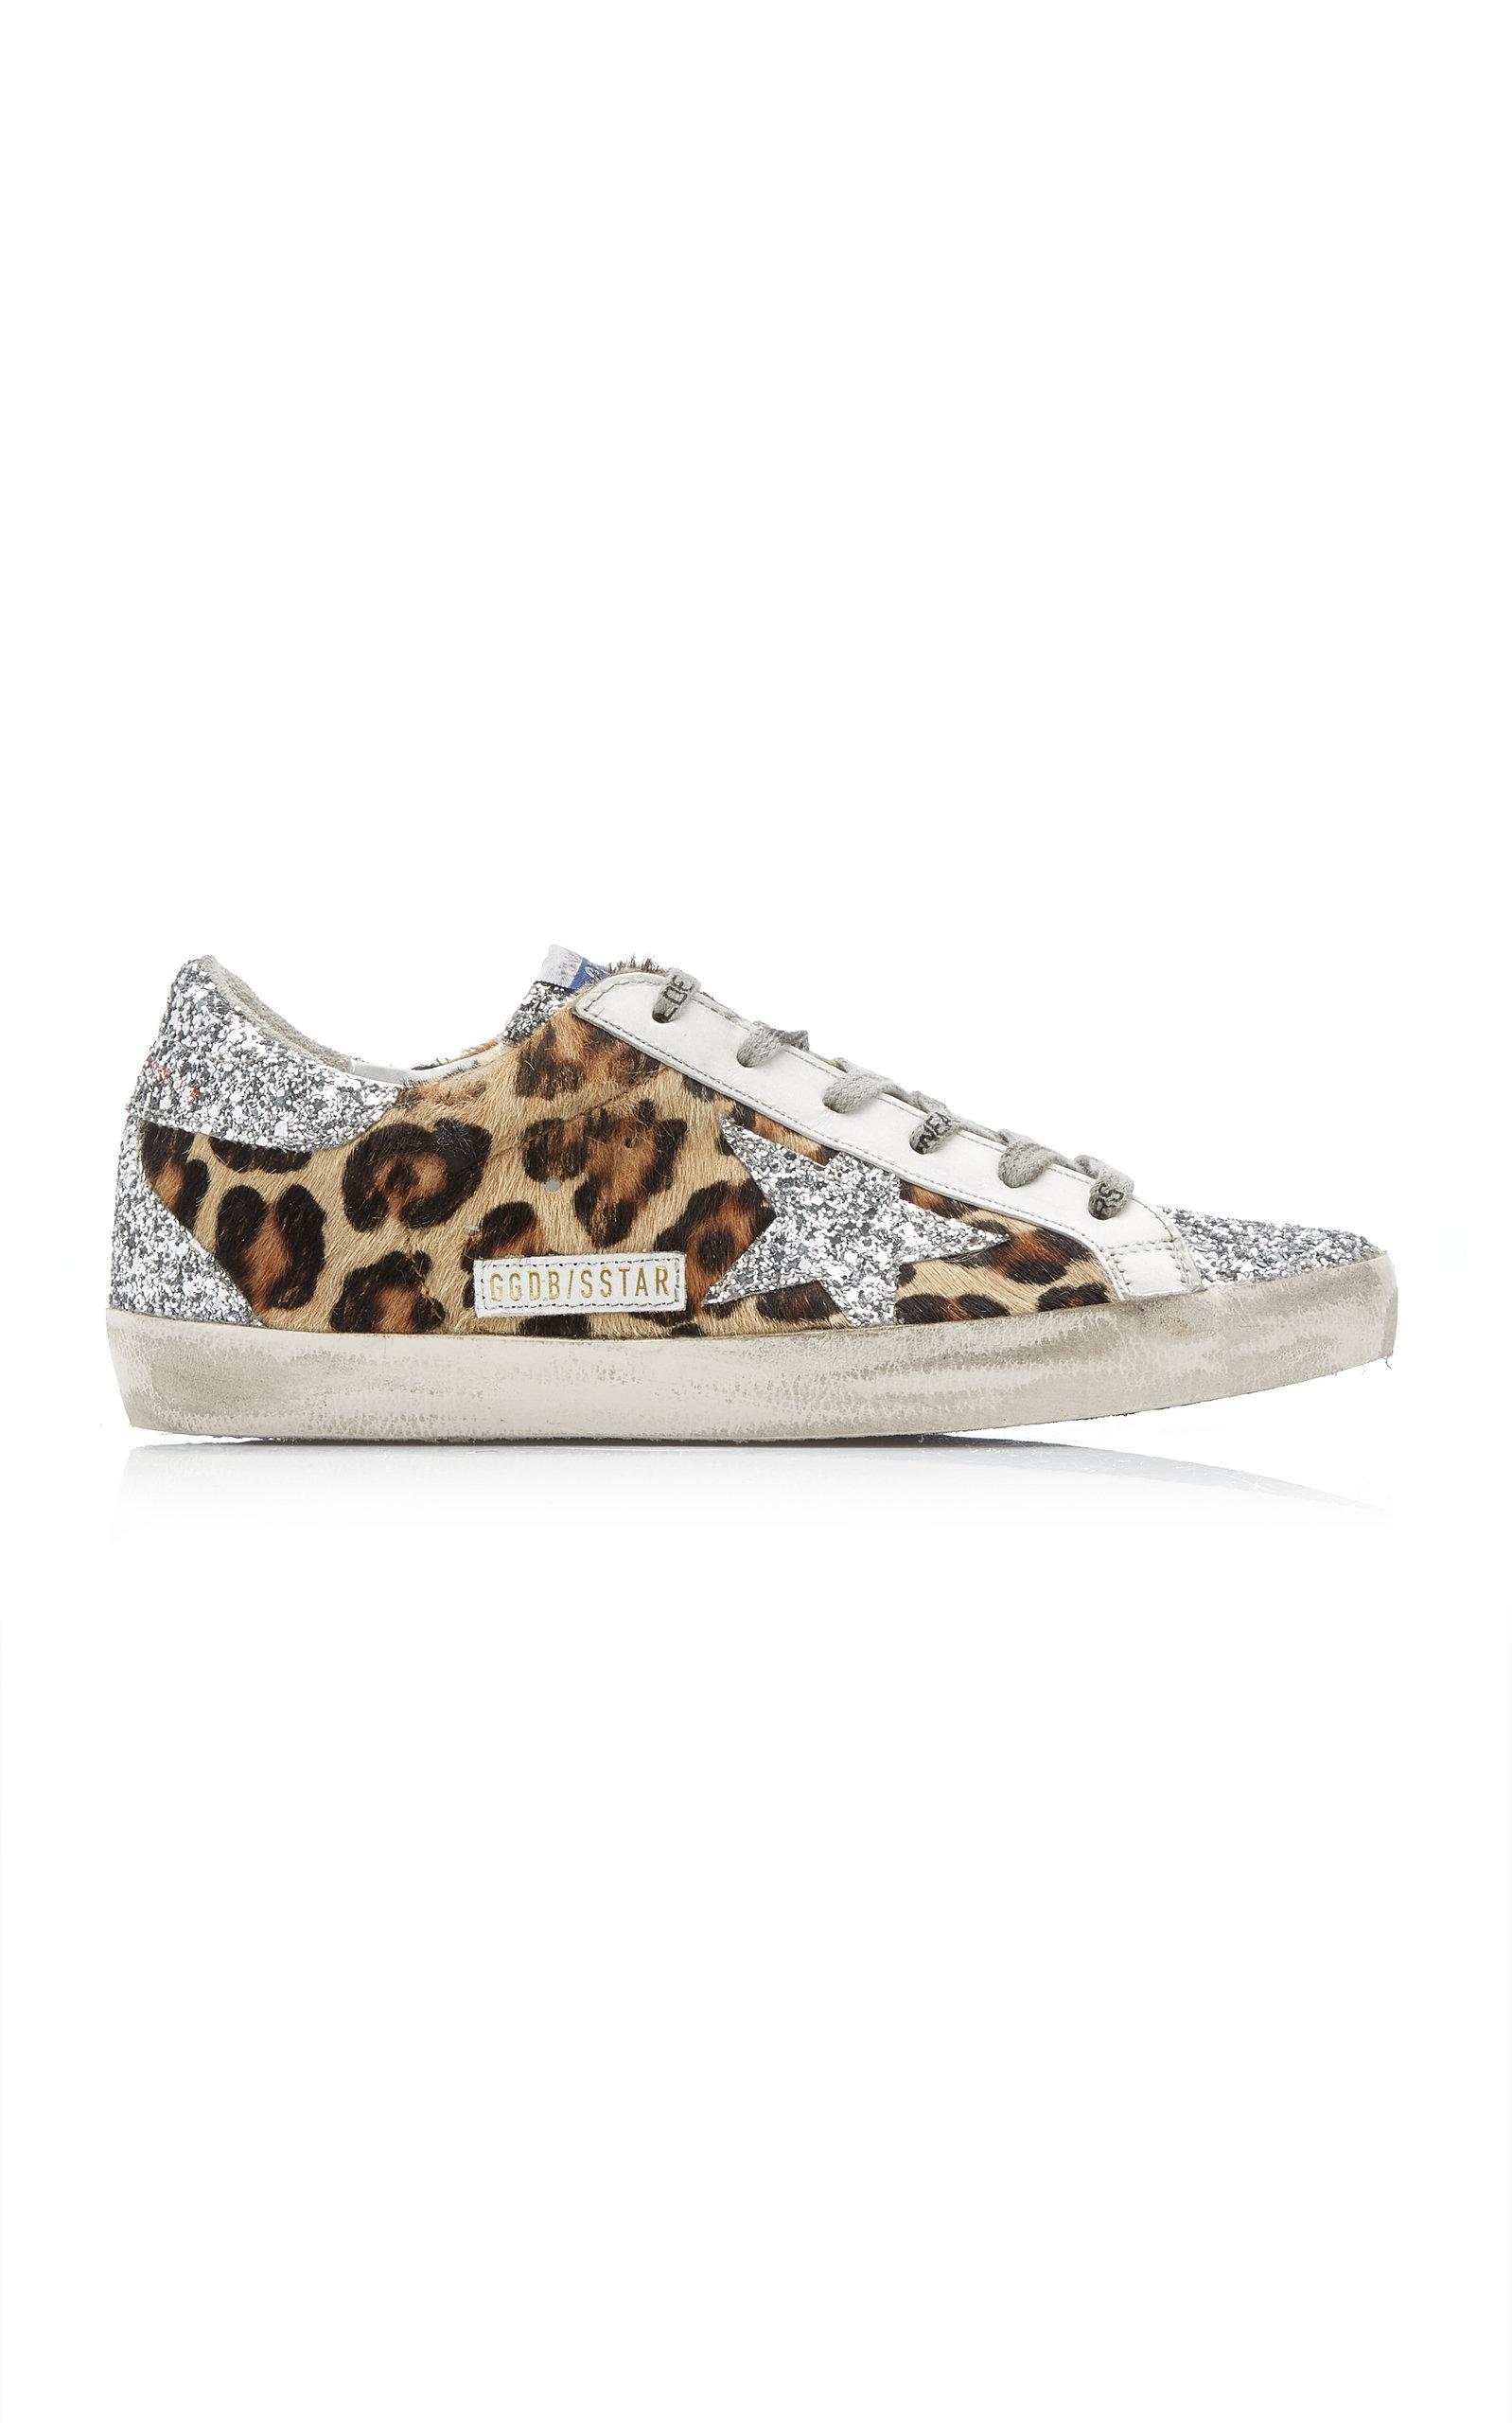 Golden Goose - Women's Superstar Glitter Leopard Sneakers  - Animal - Moda Operandi